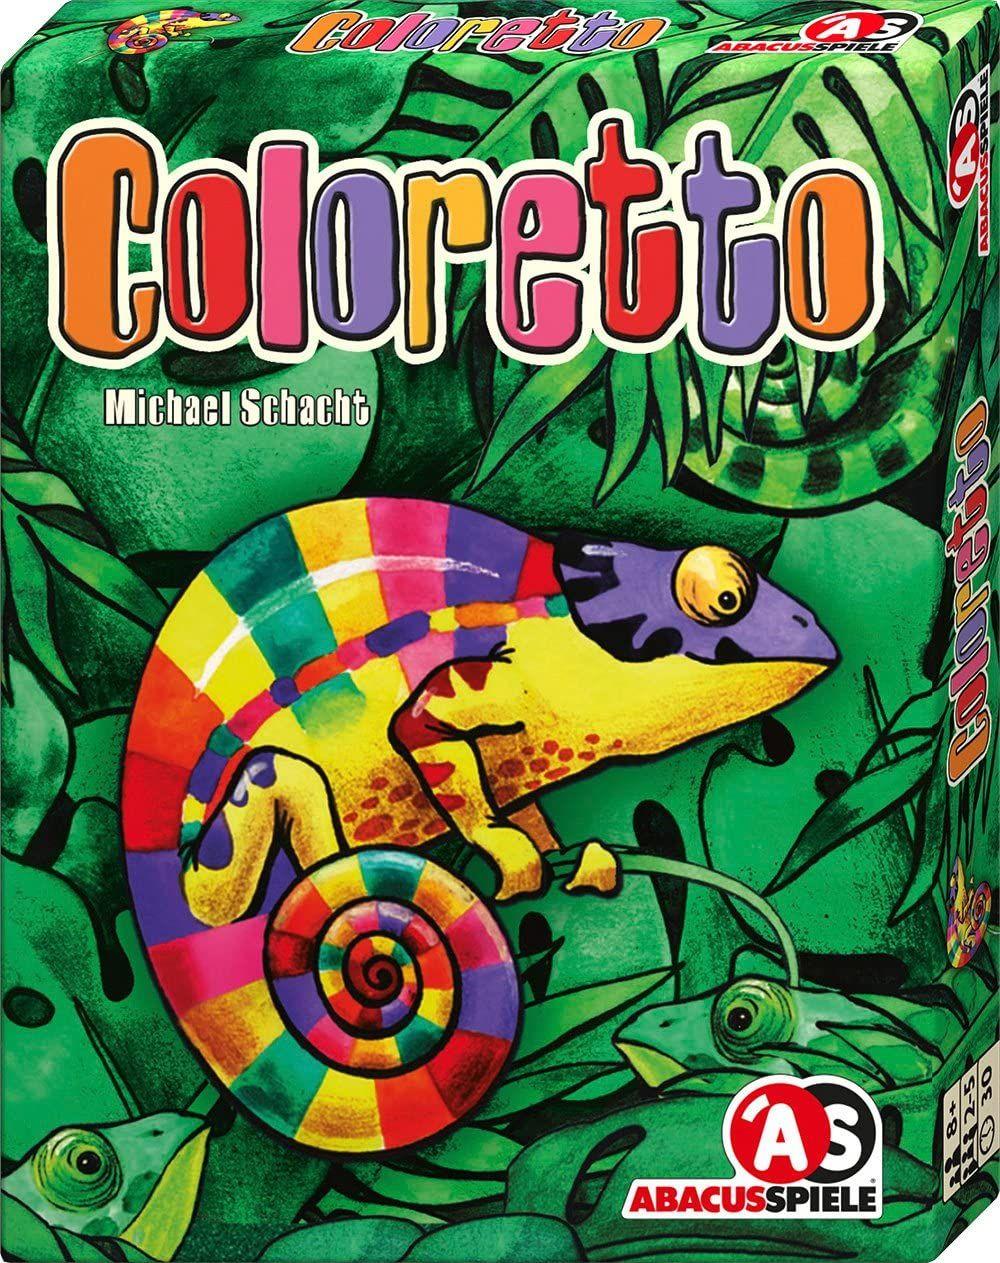 Coloretto juego de mesa